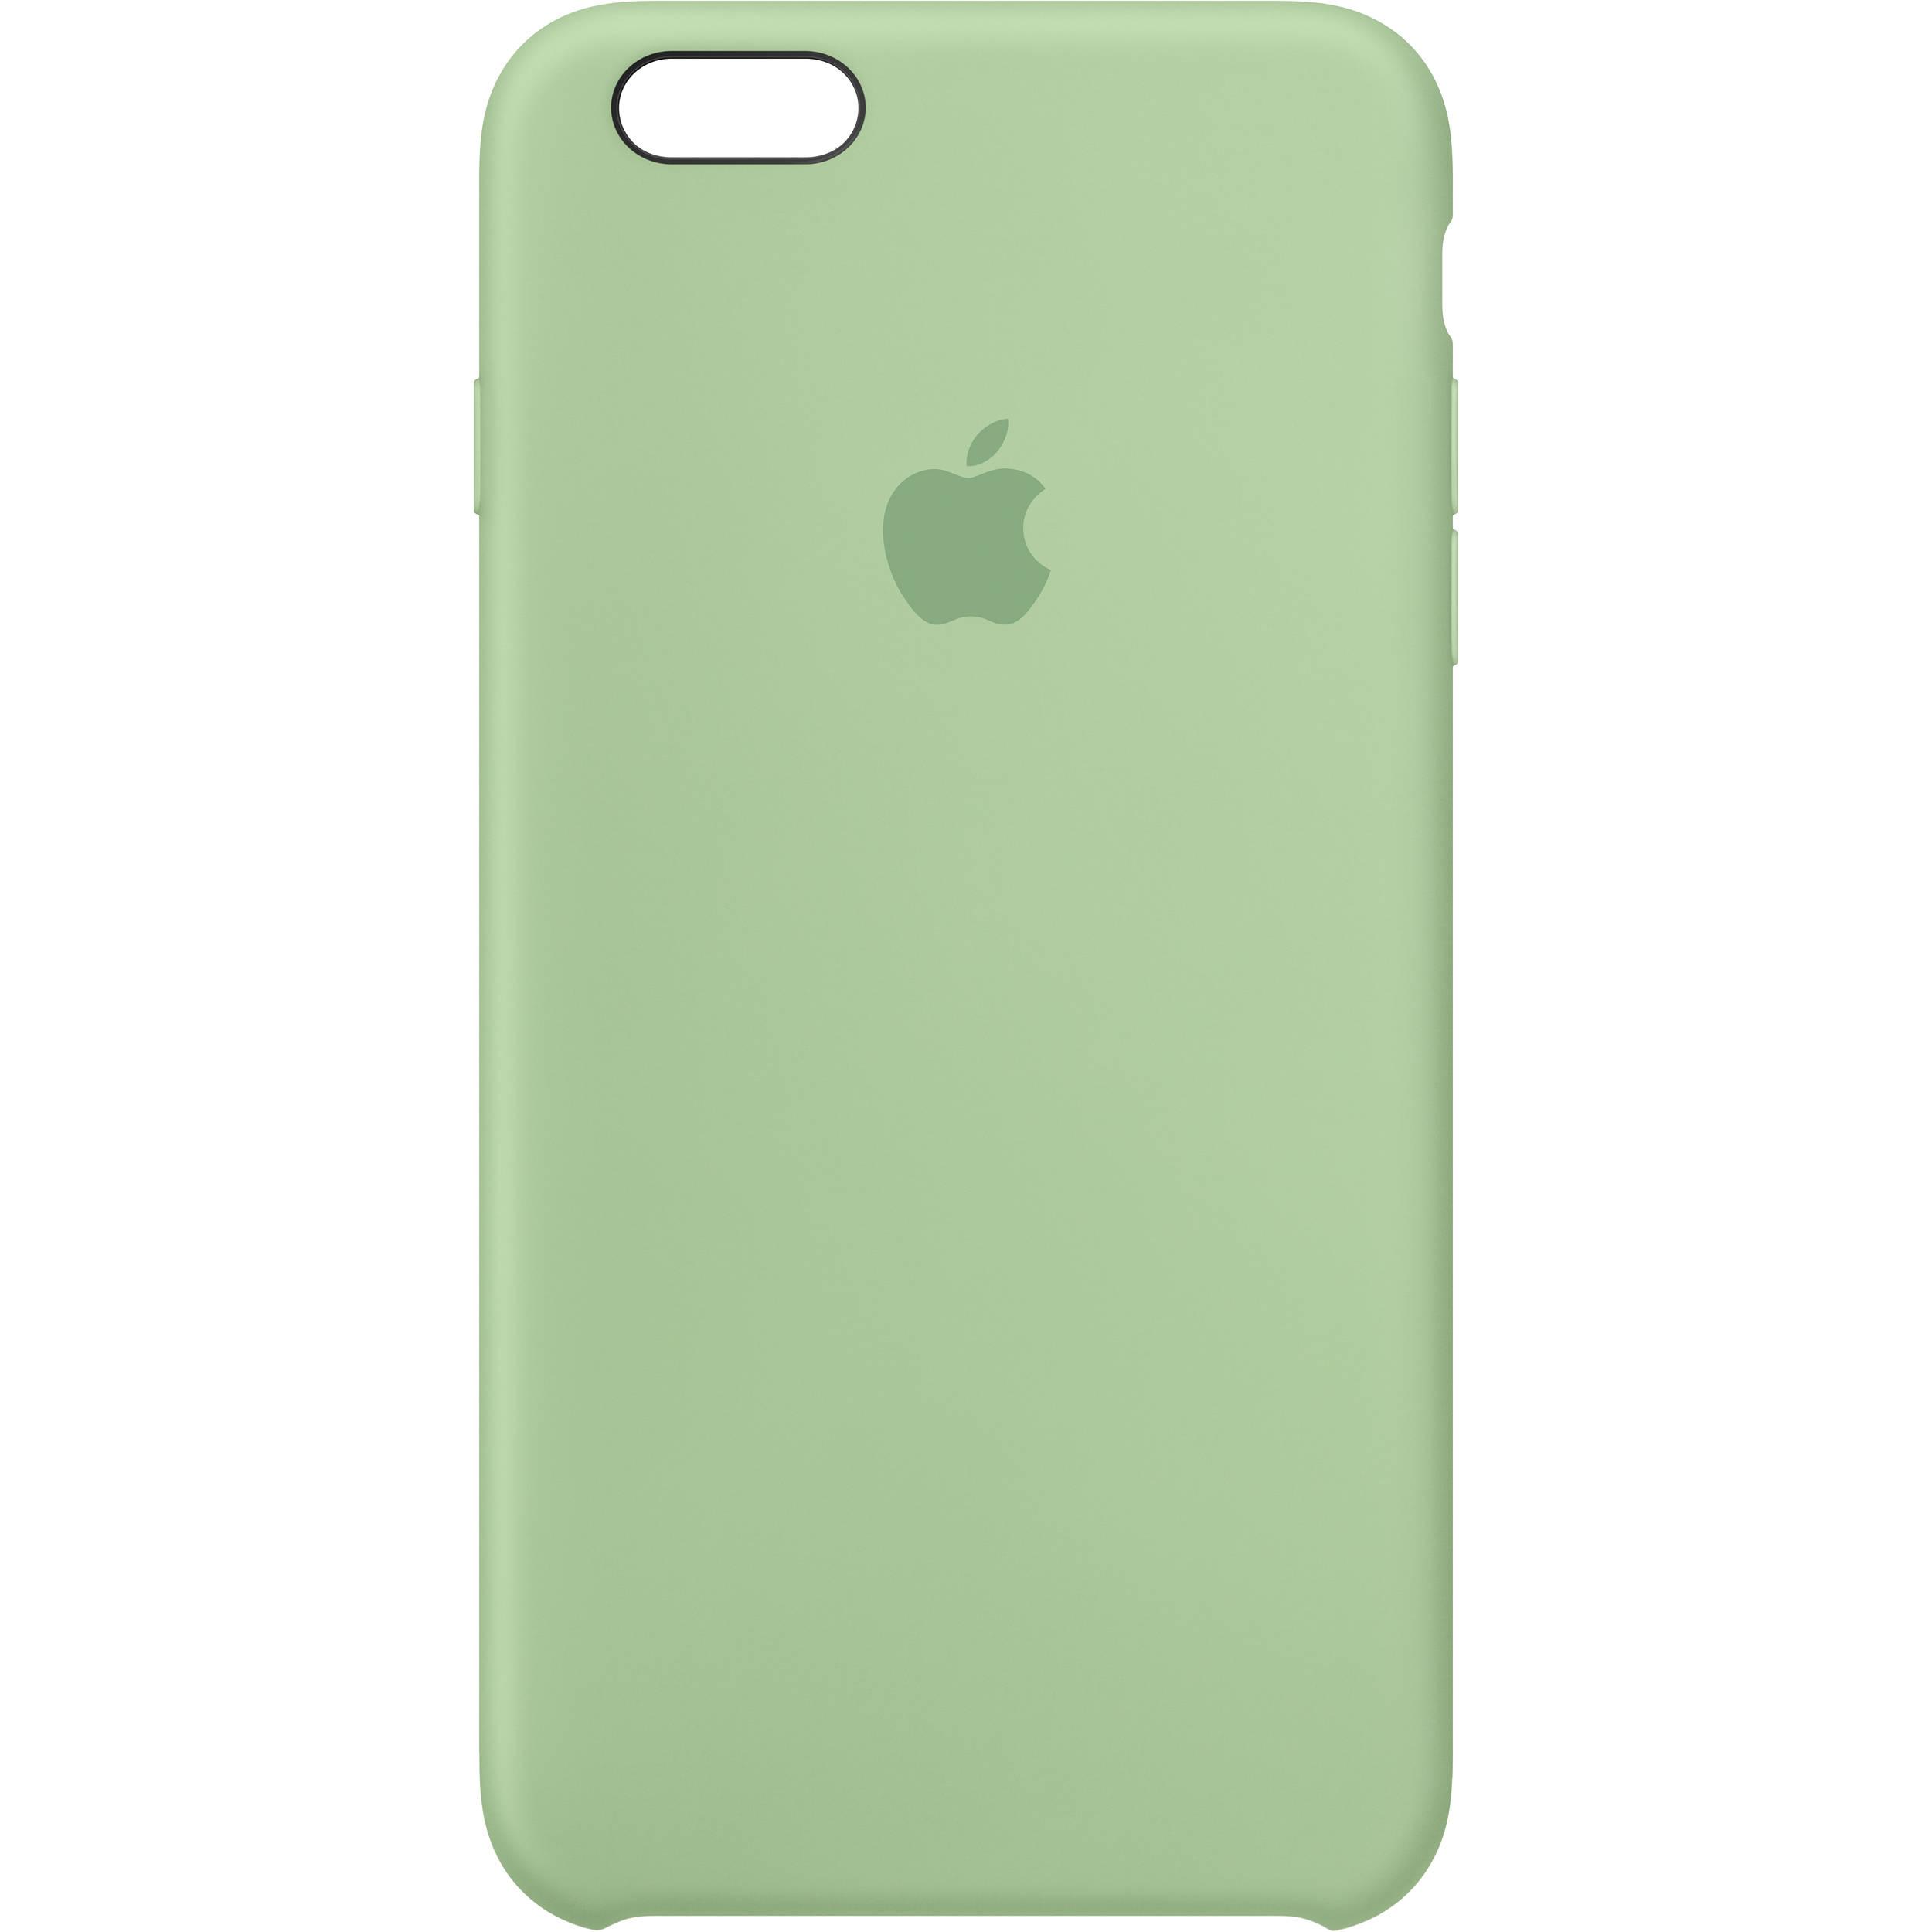 new arrival c1821 3ff8e Apple iPhone 6 Plus/6s Plus Silicone Case (Mint)